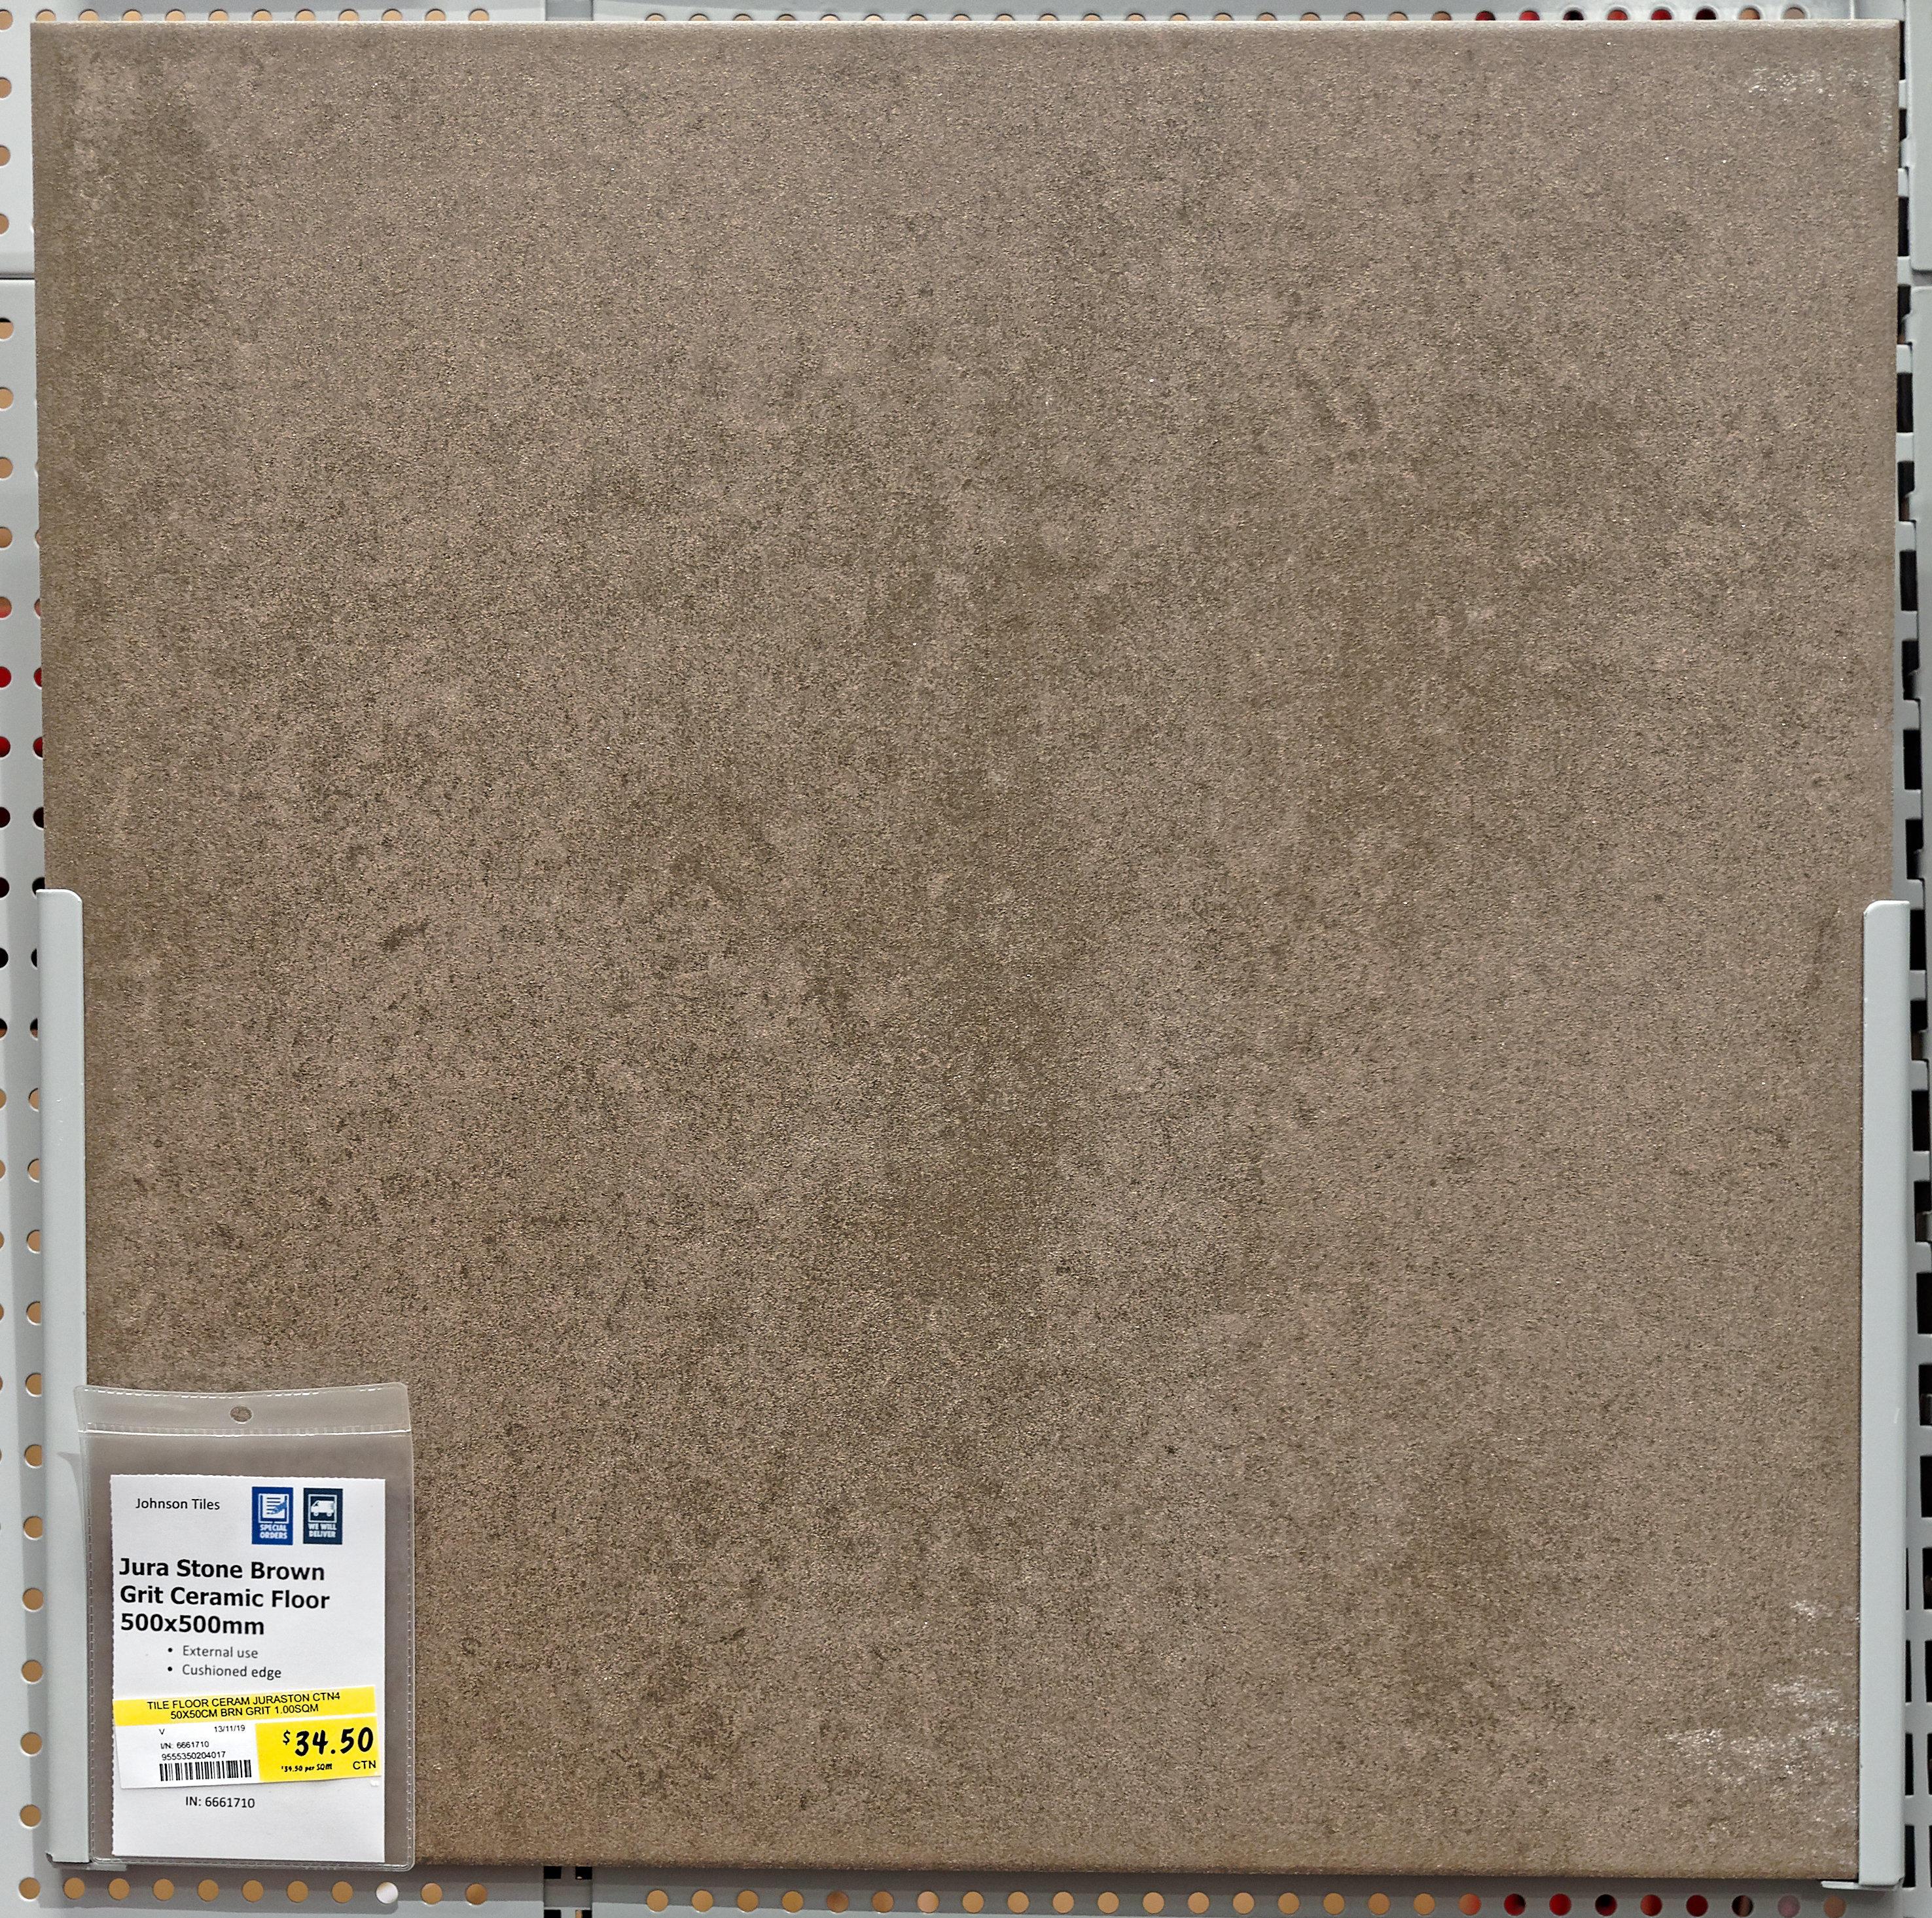 Tiles-1.jpeg